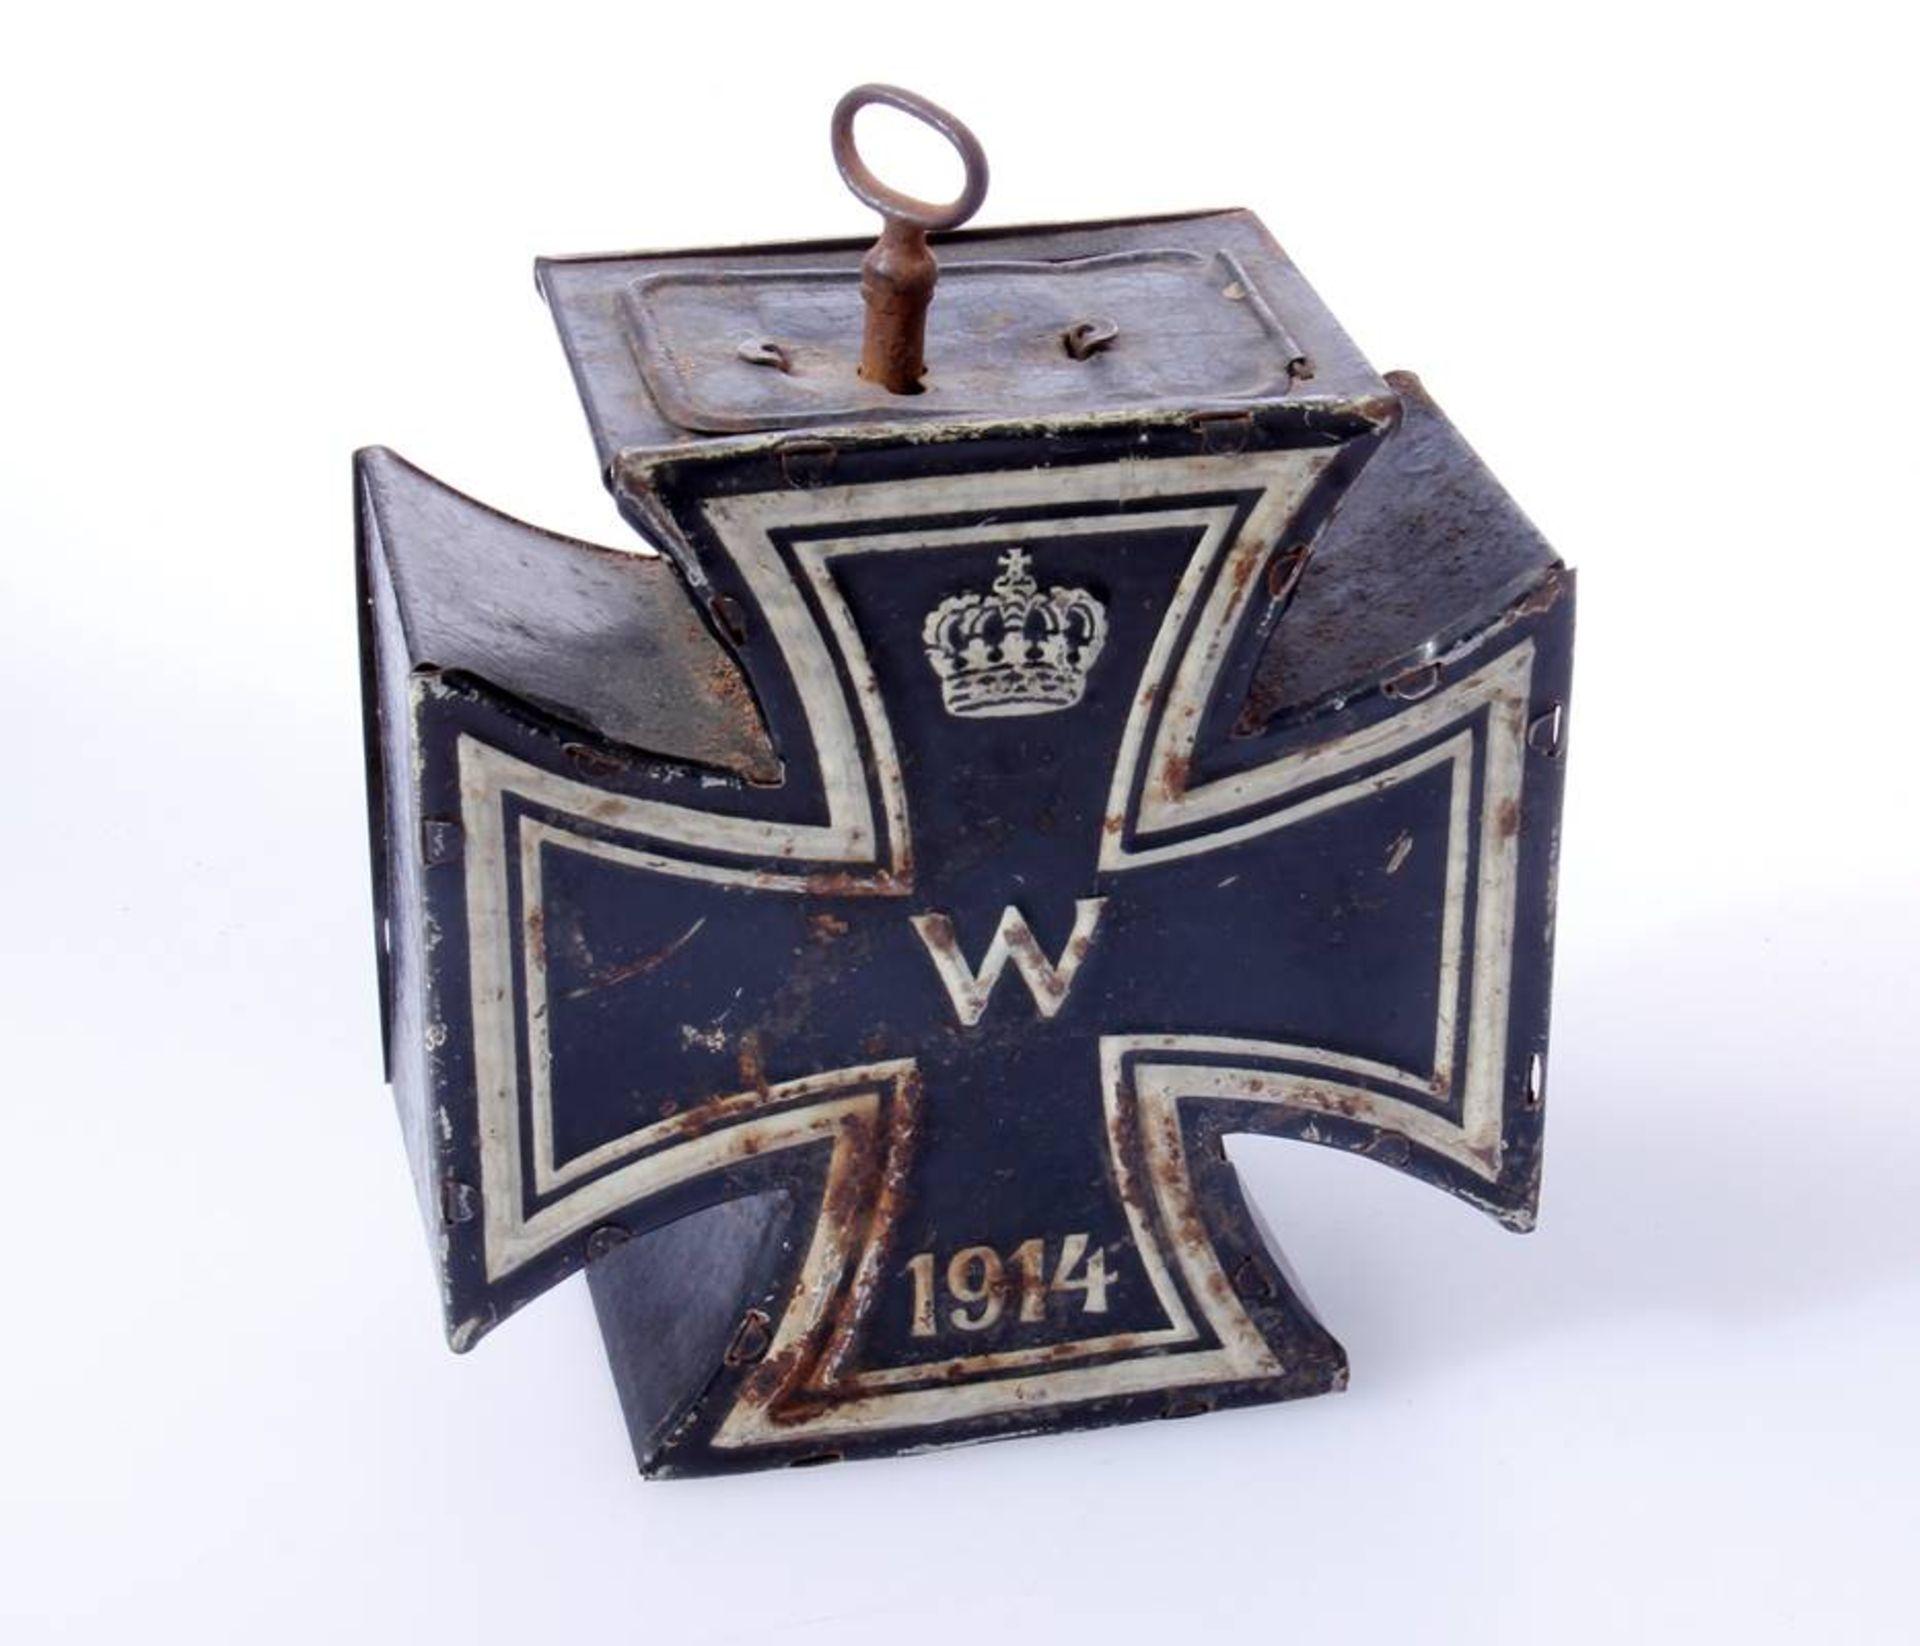 Spardose Eisernes Kreuz 2. Klasse 1914Großes Kreuz in der Form des Eisernen Kreuze 1914. Spardose - Bild 2 aus 4